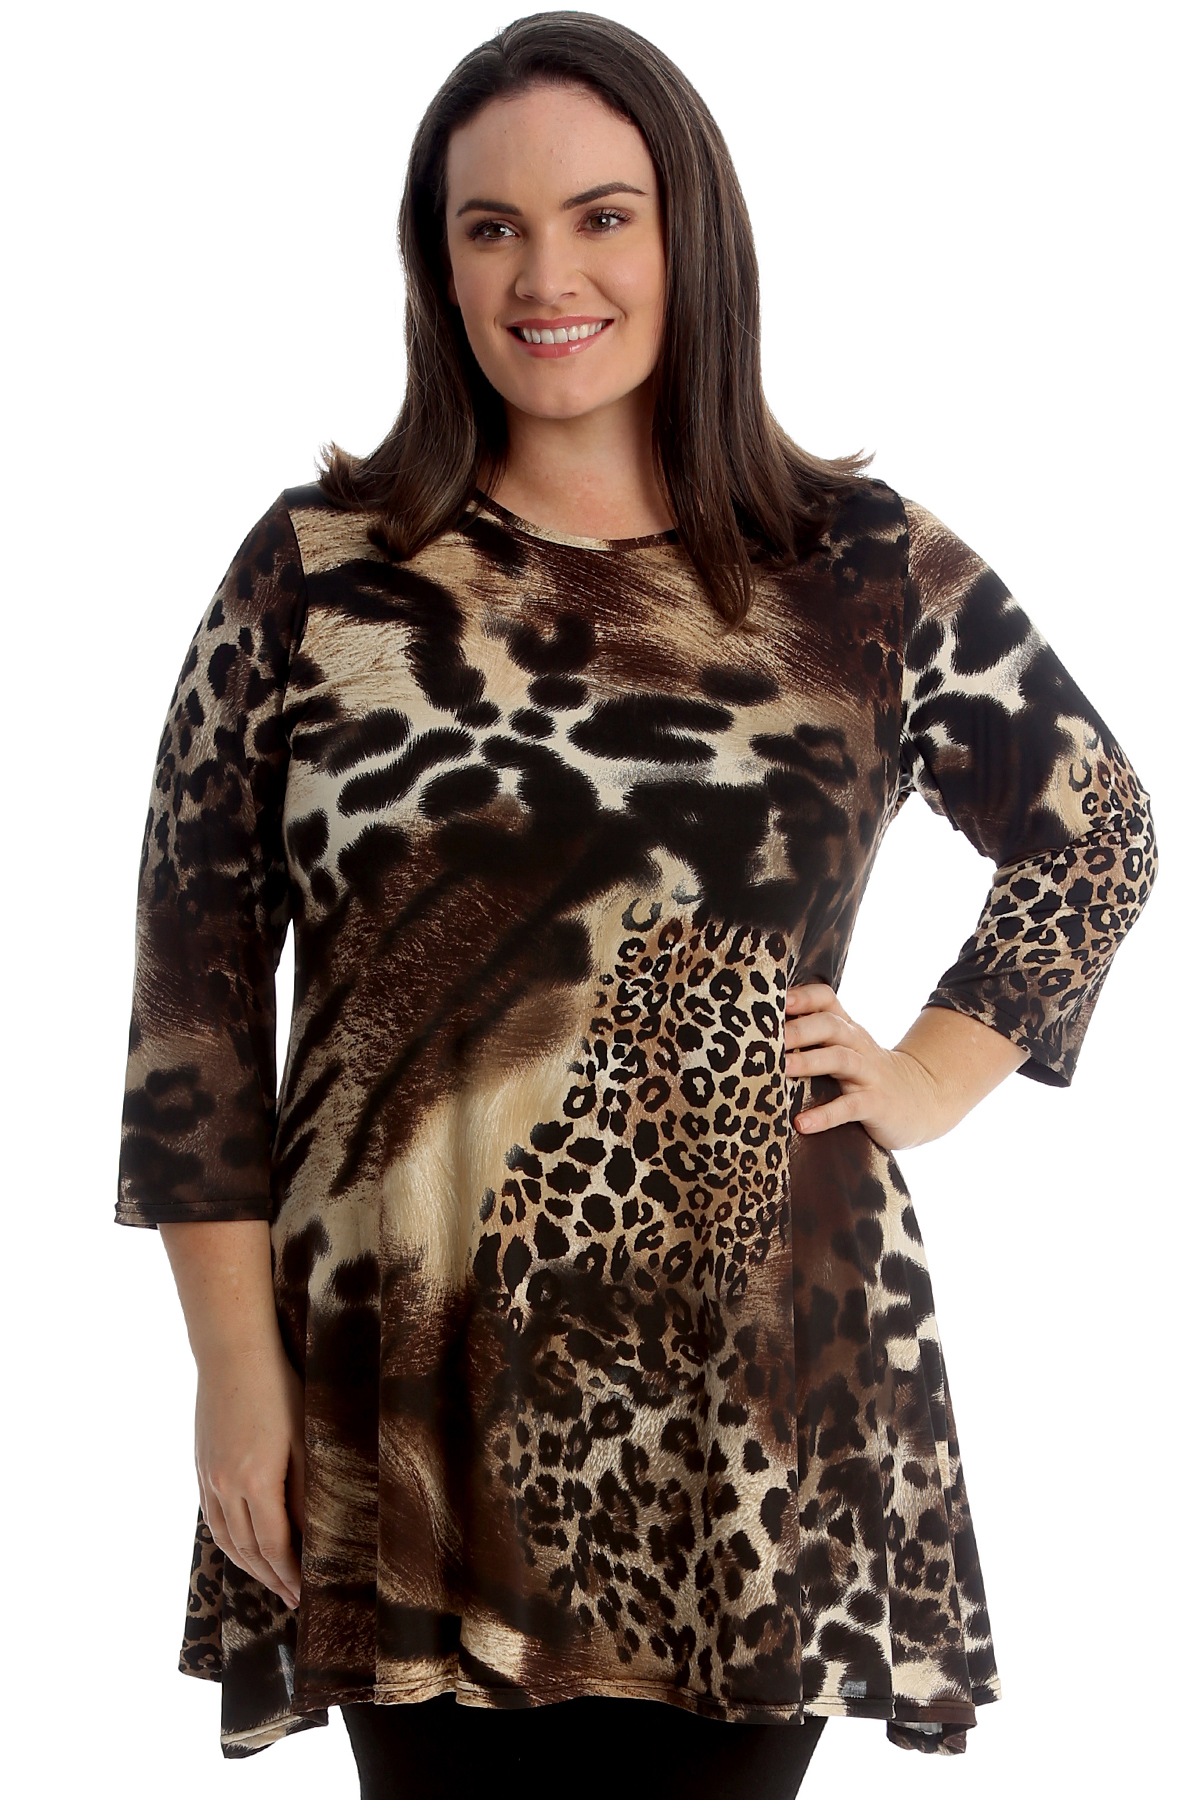 Evans ladies maxi dress shirt style plus size 14 16 18 20 22 animal tiger print